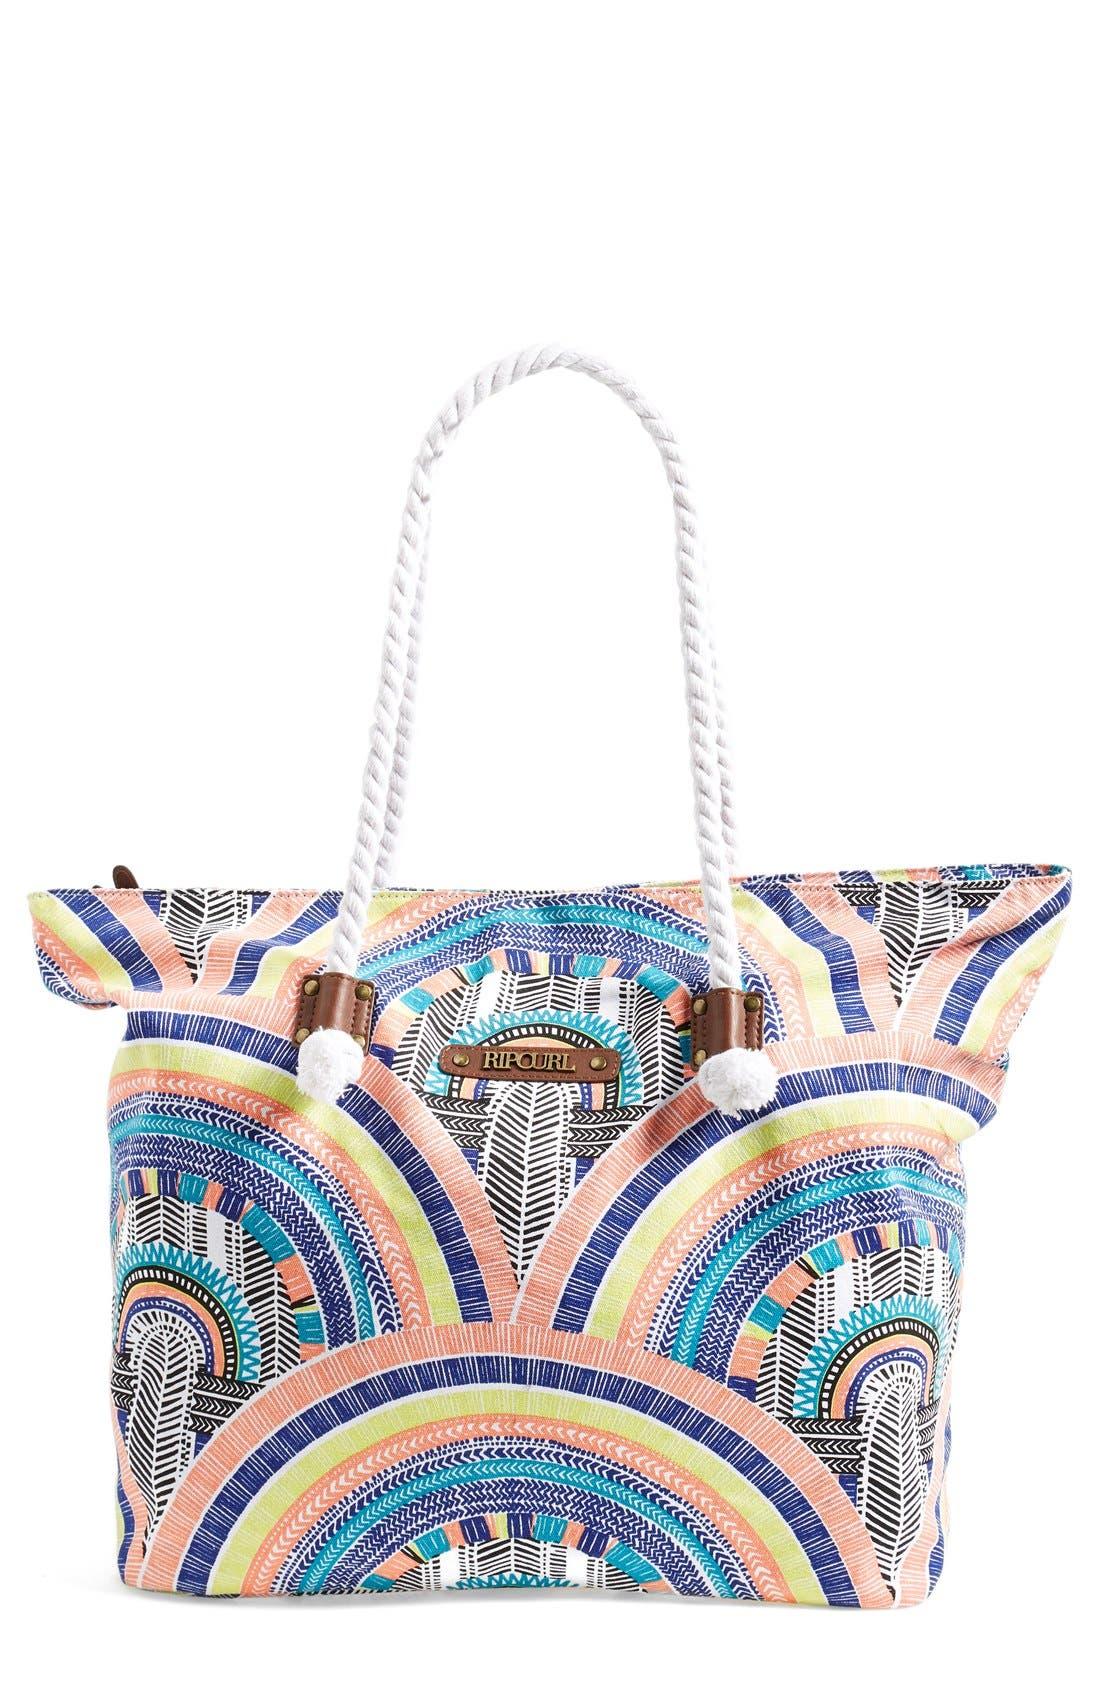 Alternate Image 1 Selected - Rip Curl 'Modern Myth' Beach Bag